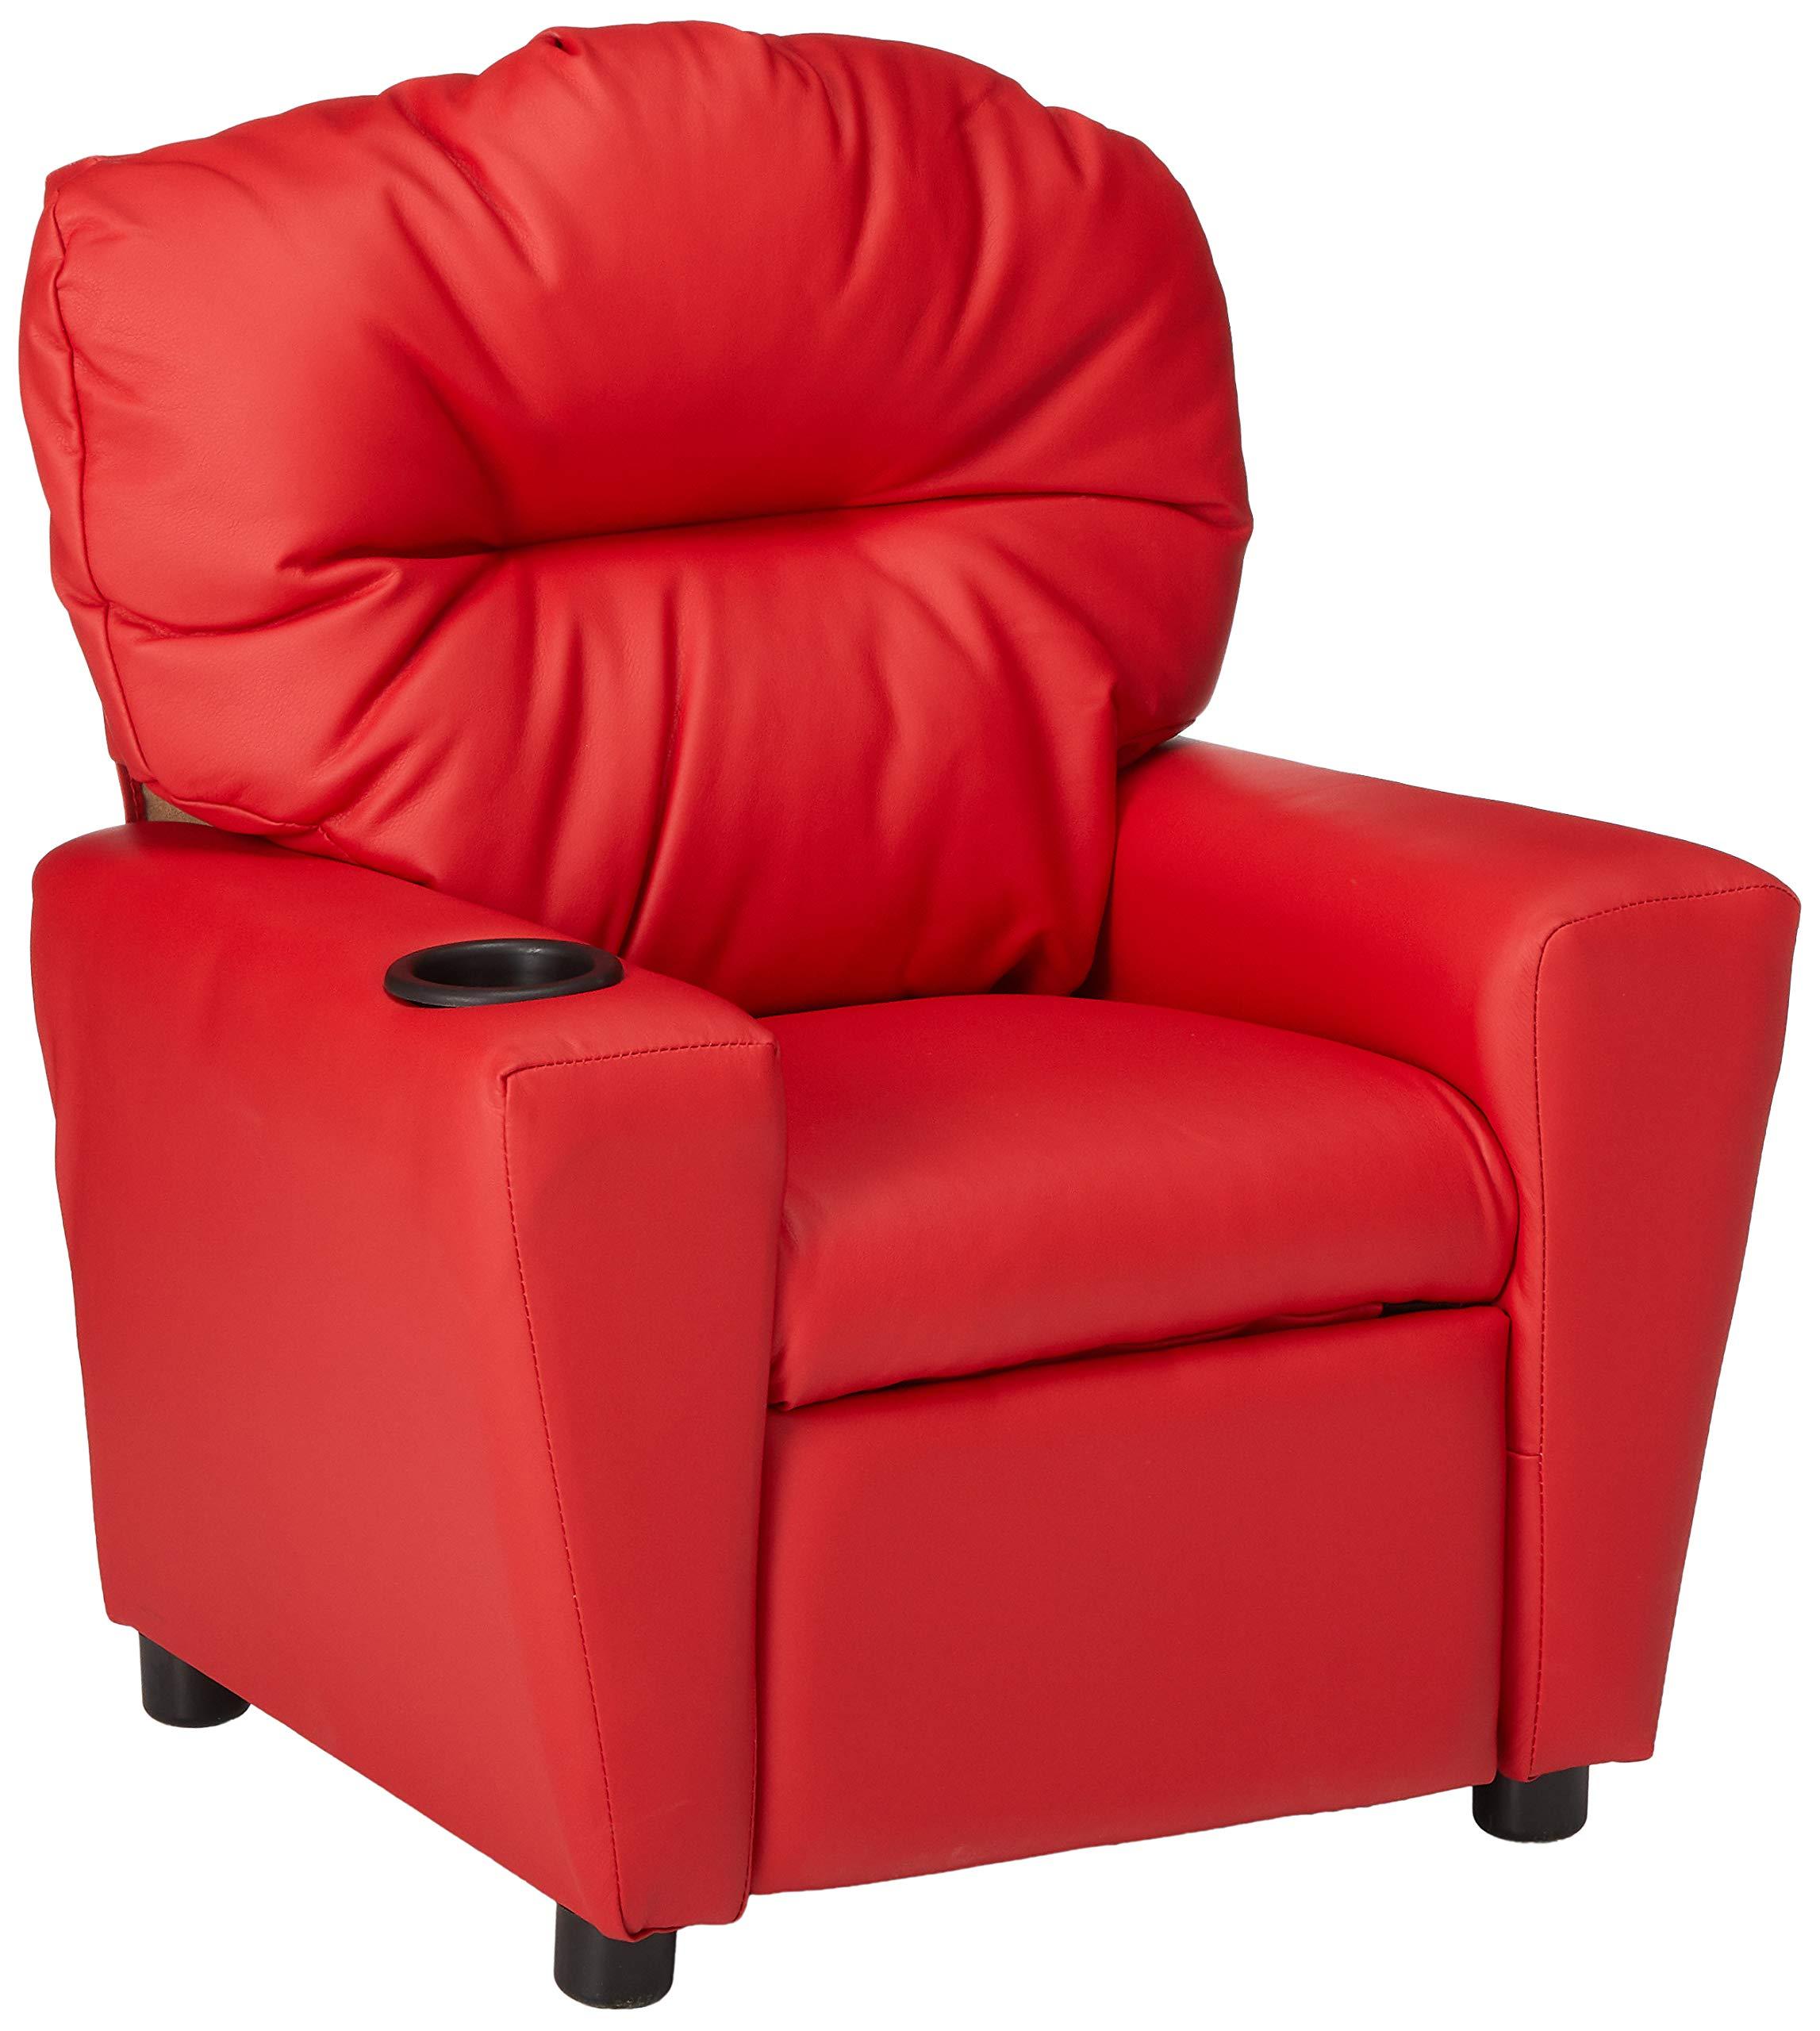 Astounding Living Room Furniture Flash Furniture Bt 7950 Kid Hot Pink Machost Co Dining Chair Design Ideas Machostcouk